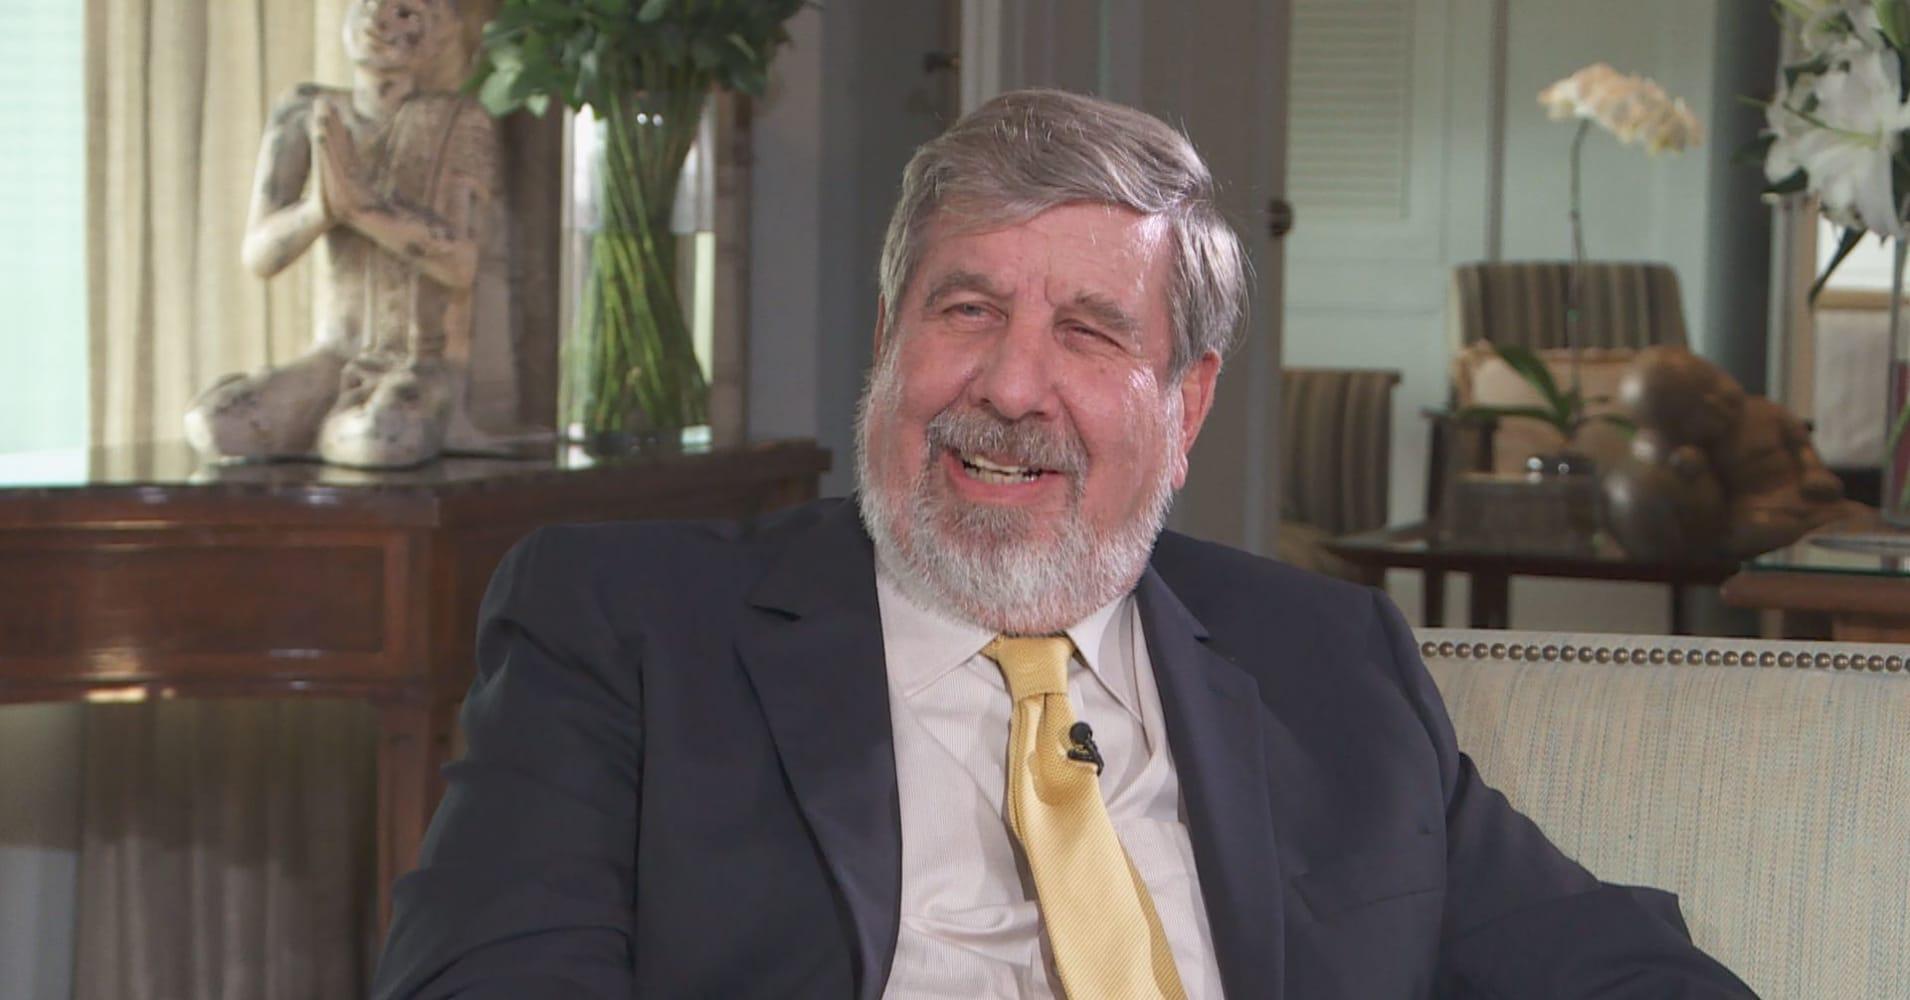 Bill Heinecke, CEO and Chairman of Minor International